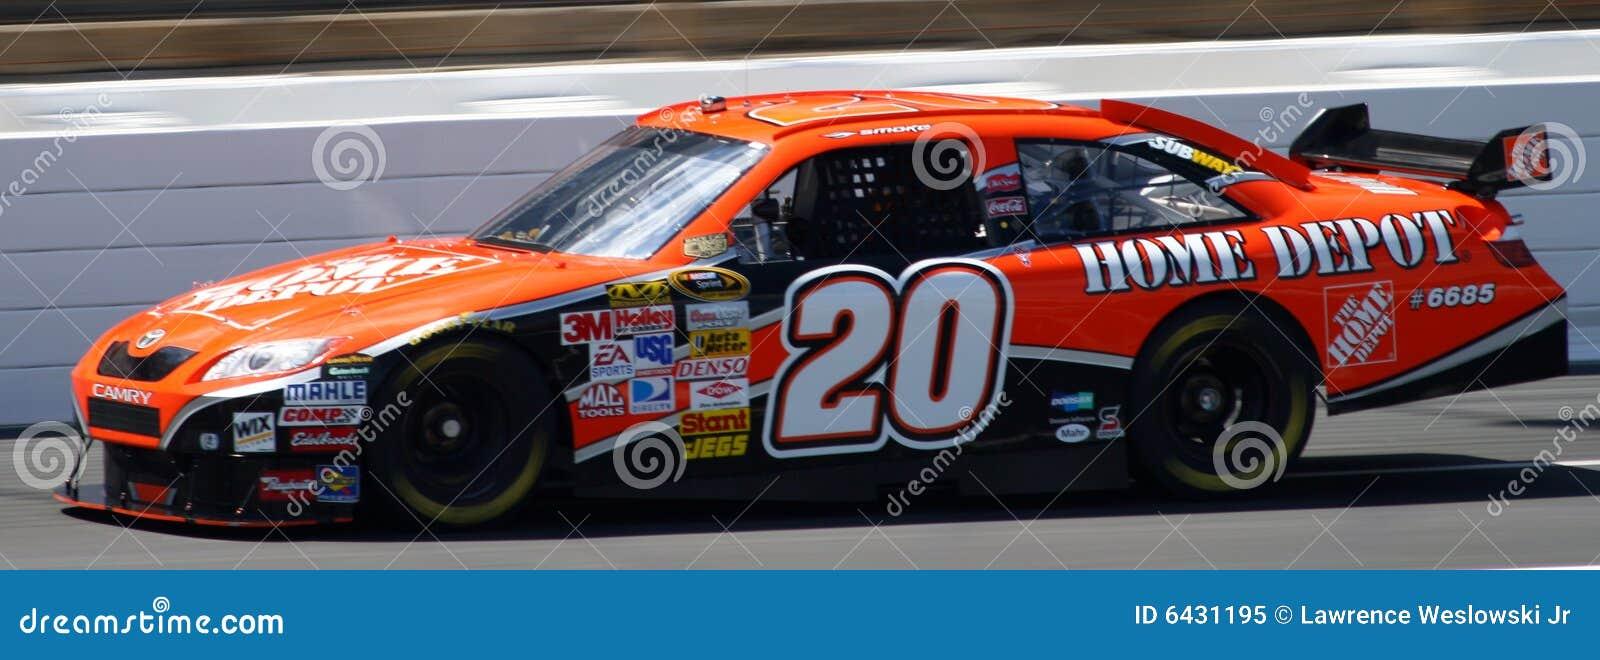 Home Depot Race Car Driver